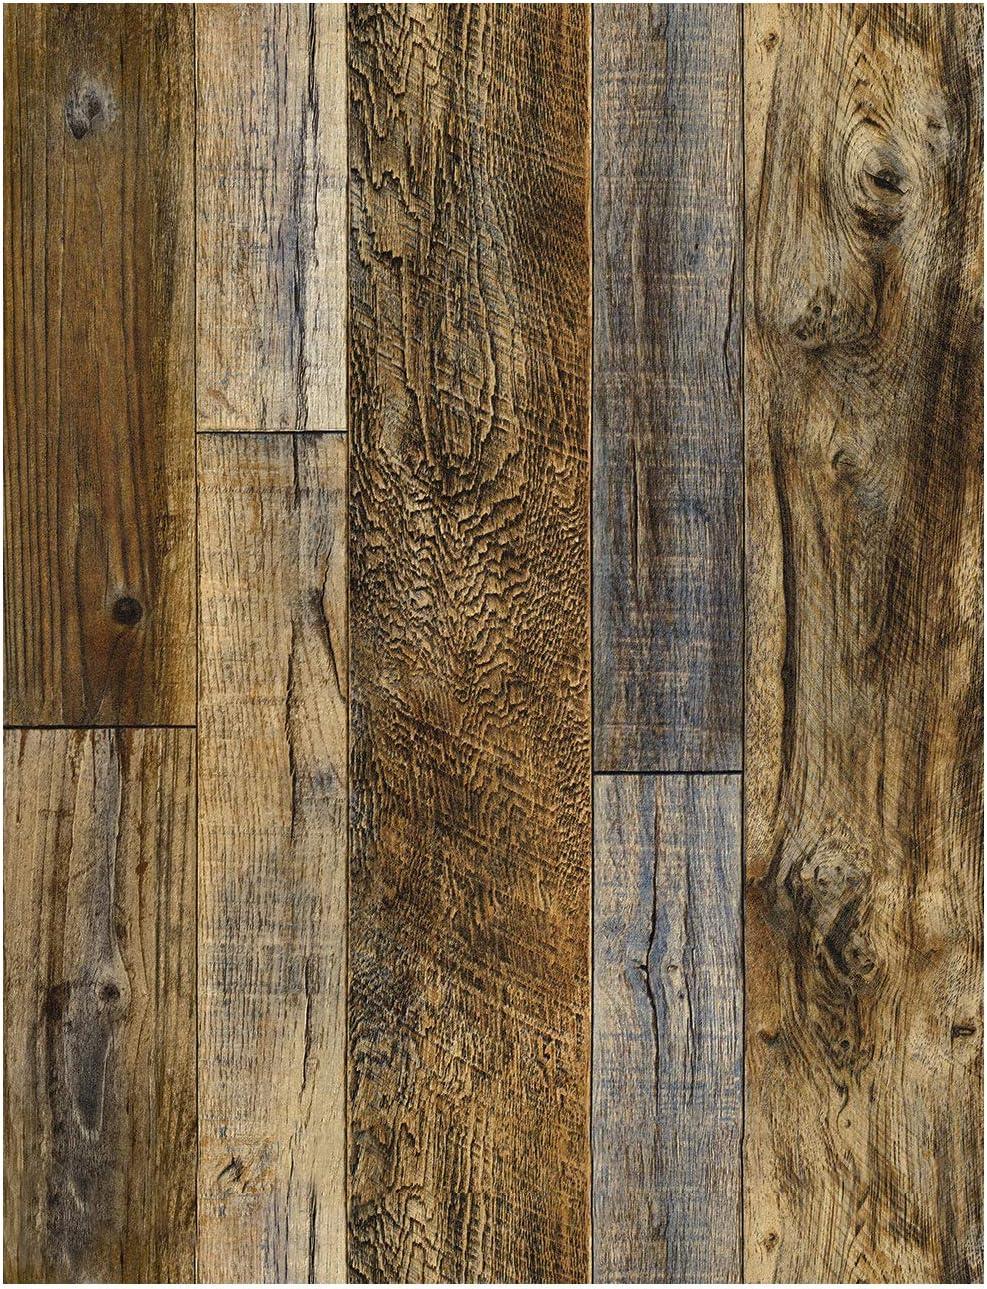 Haokhome 92048 2 Peel And Stick Wood Plank Wallpaper Shiplap 17 7 X 9 8ft Brown Vinyl Self Adhesive Decorative Amazon Com